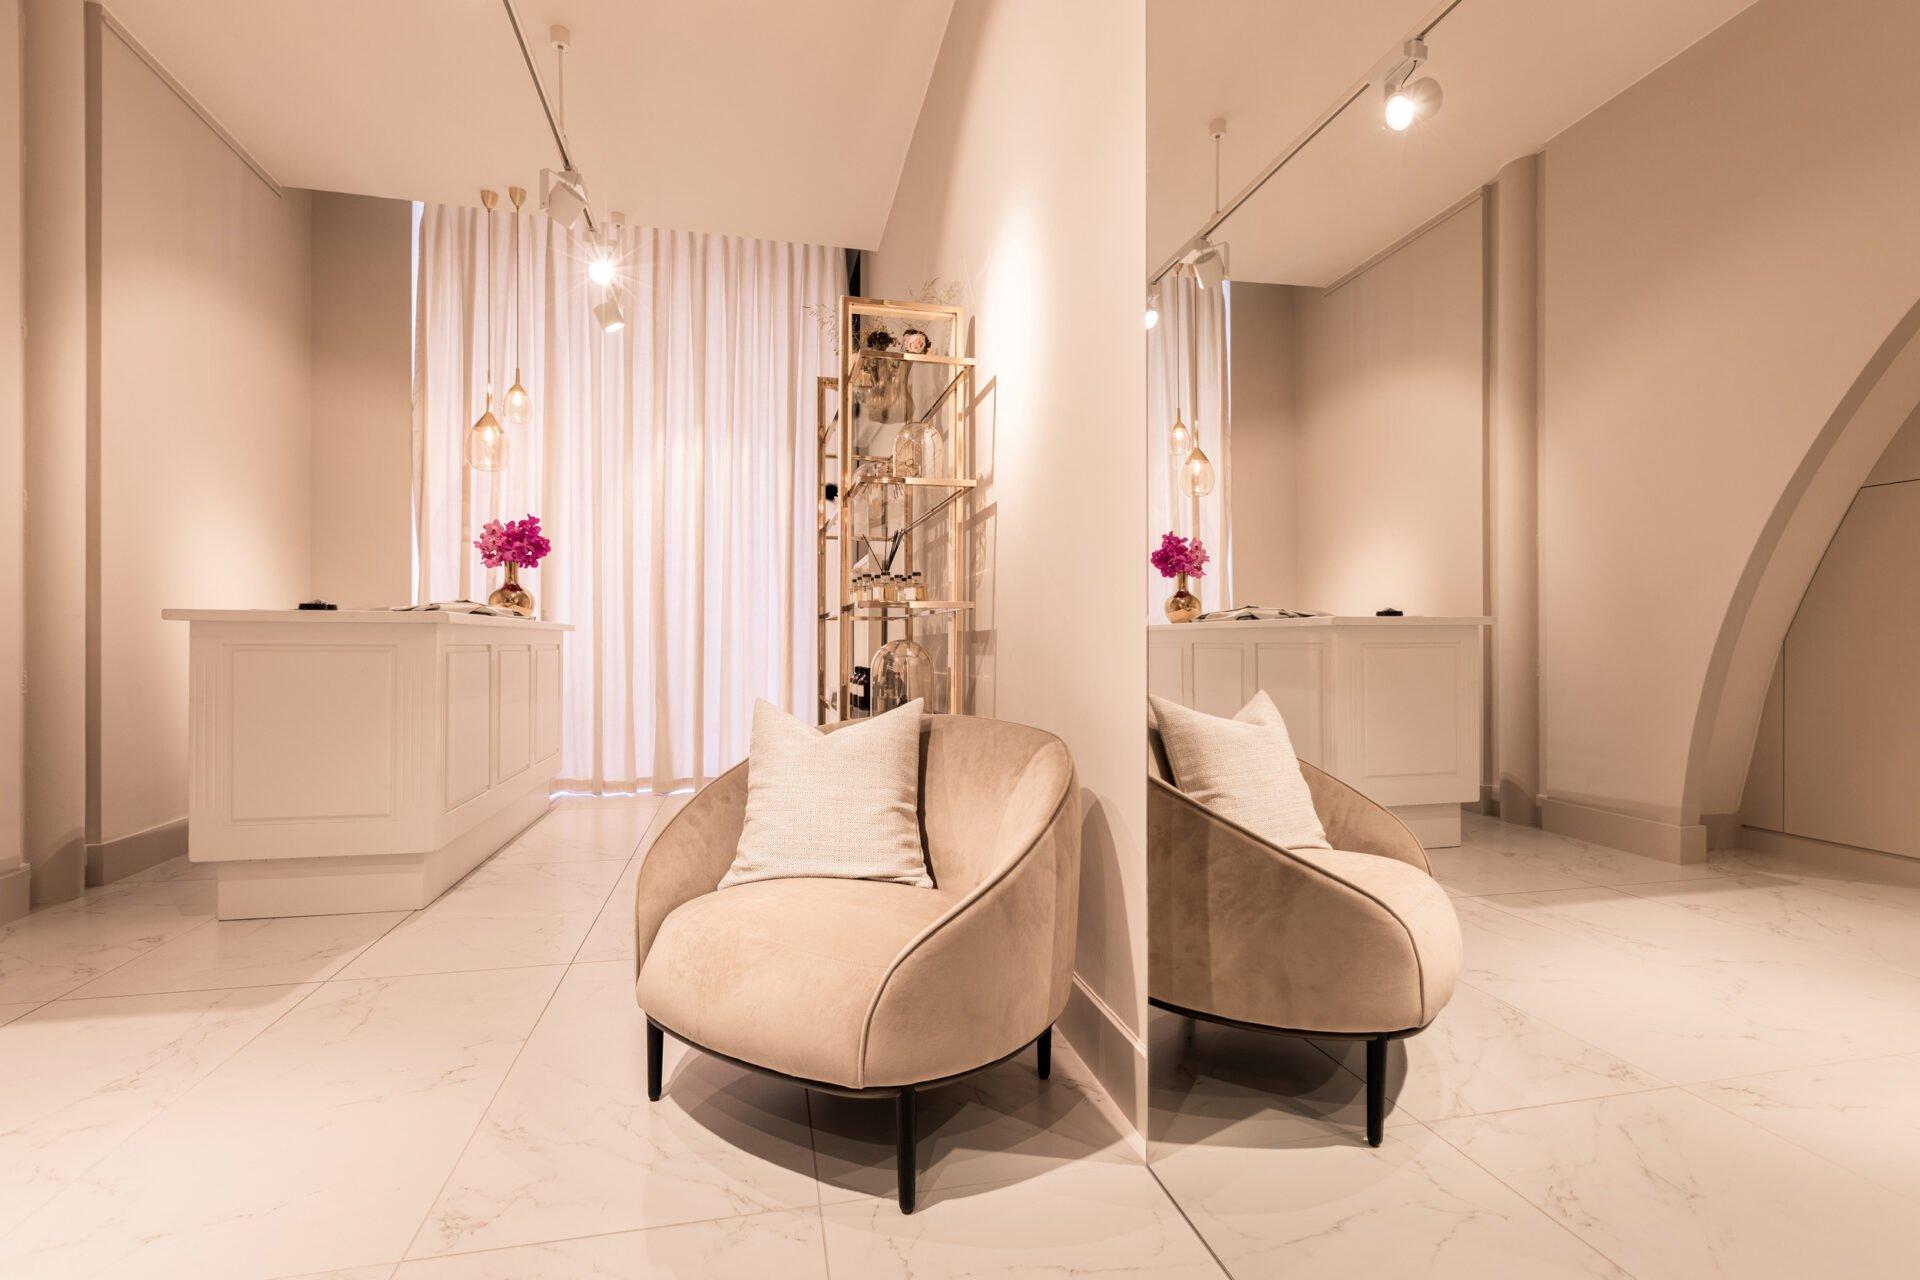 interior design sewing boutique scissors mirror chair